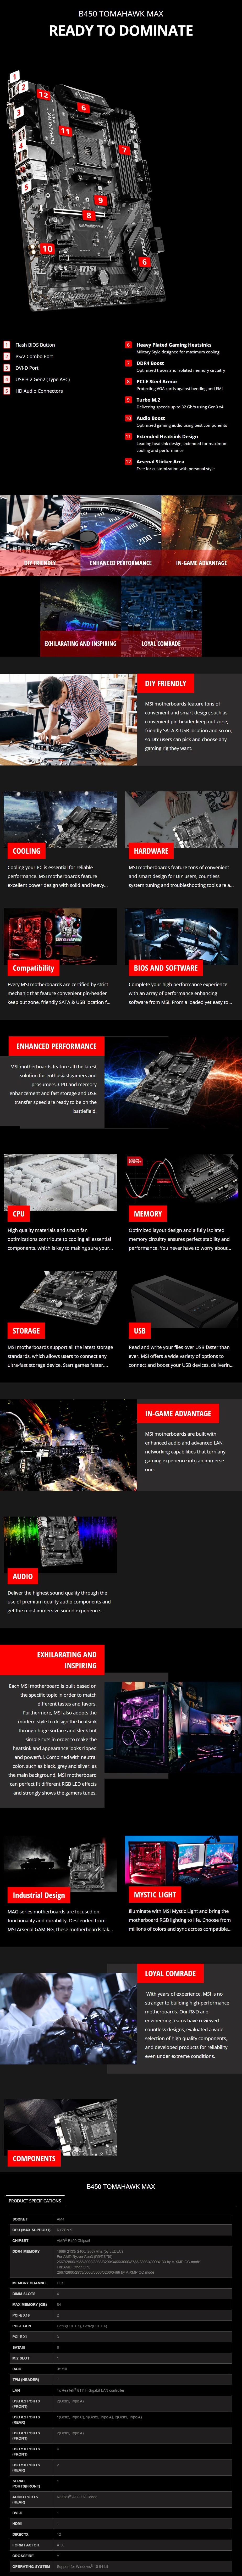 MSI B450 Tomahawk Max Motherboard -Brand New, Refurbished